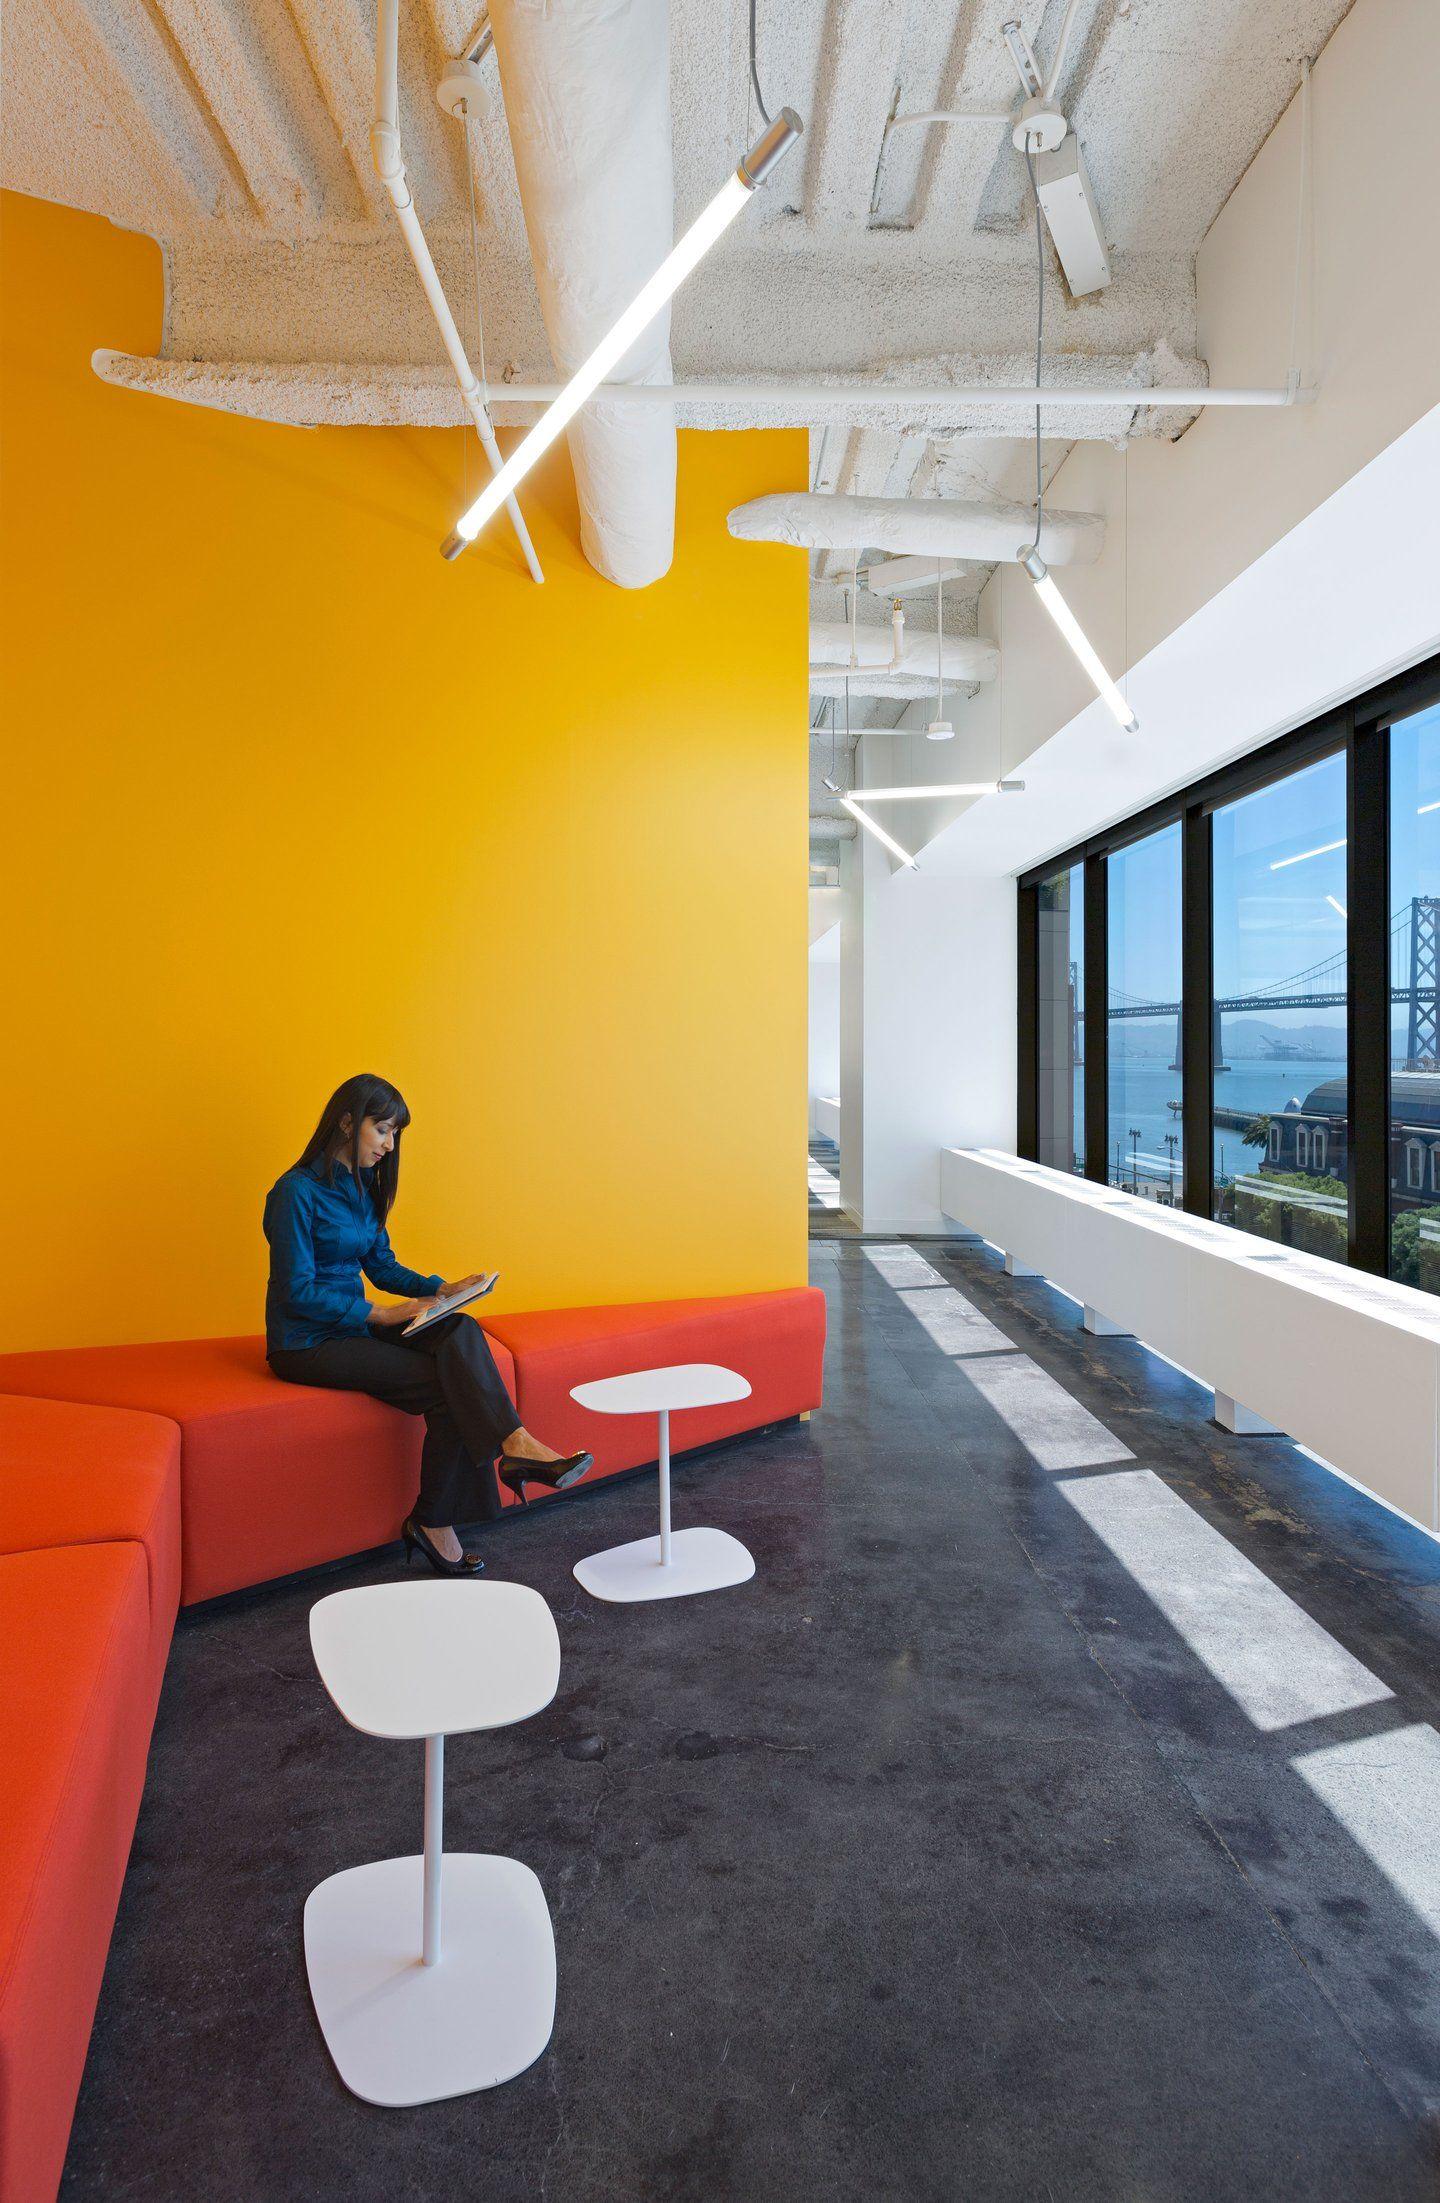 Autodesk Room Design: Office Space Inspiration, Interior